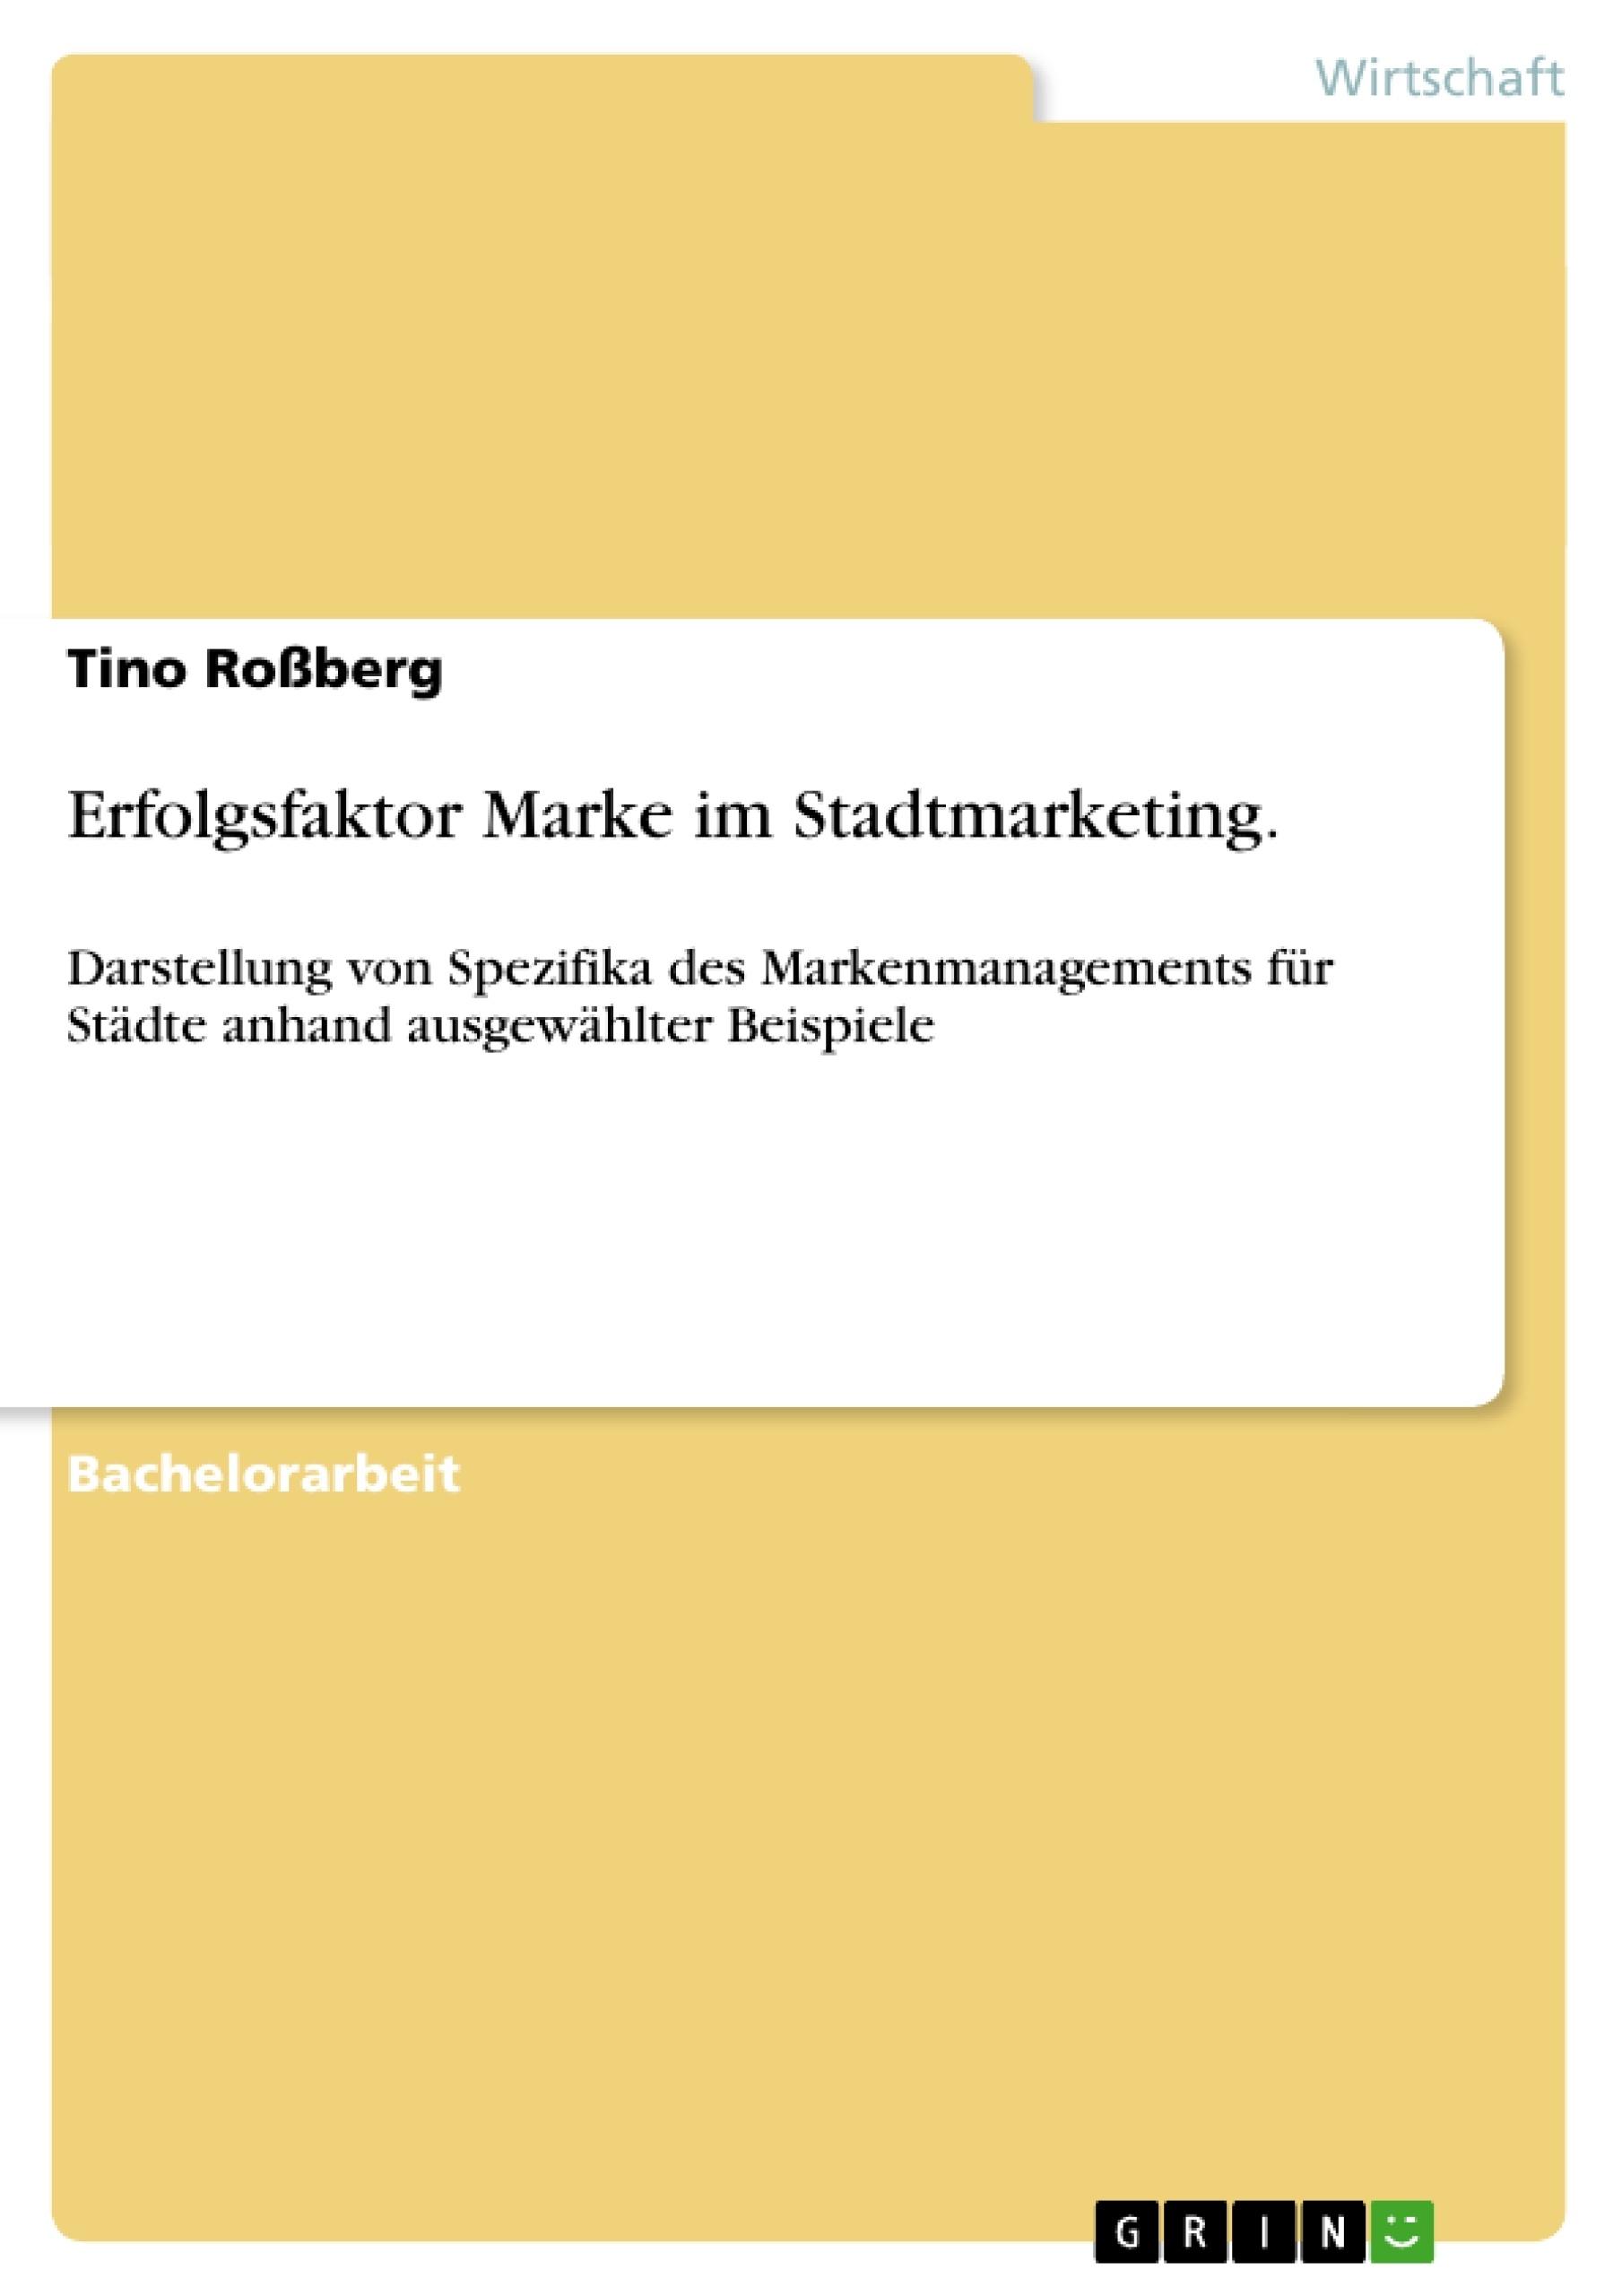 Titel: Erfolgsfaktor Marke im Stadtmarketing.